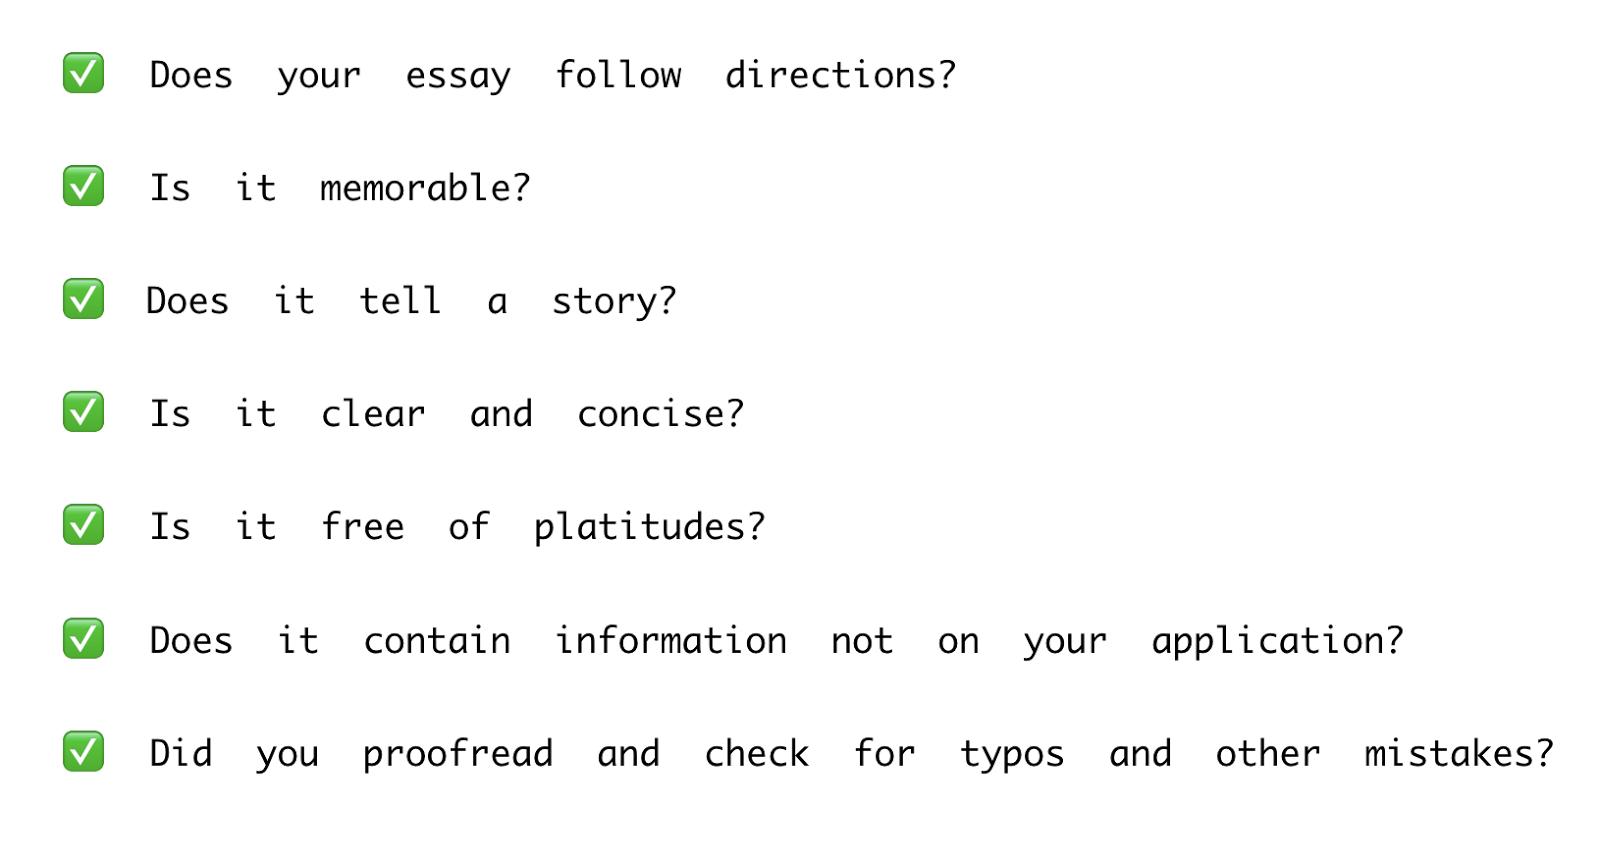 005 84342c807cd6 Pasted20image200 Essay Example Scholarship Singular Tips Rotc Psc Reddit Full